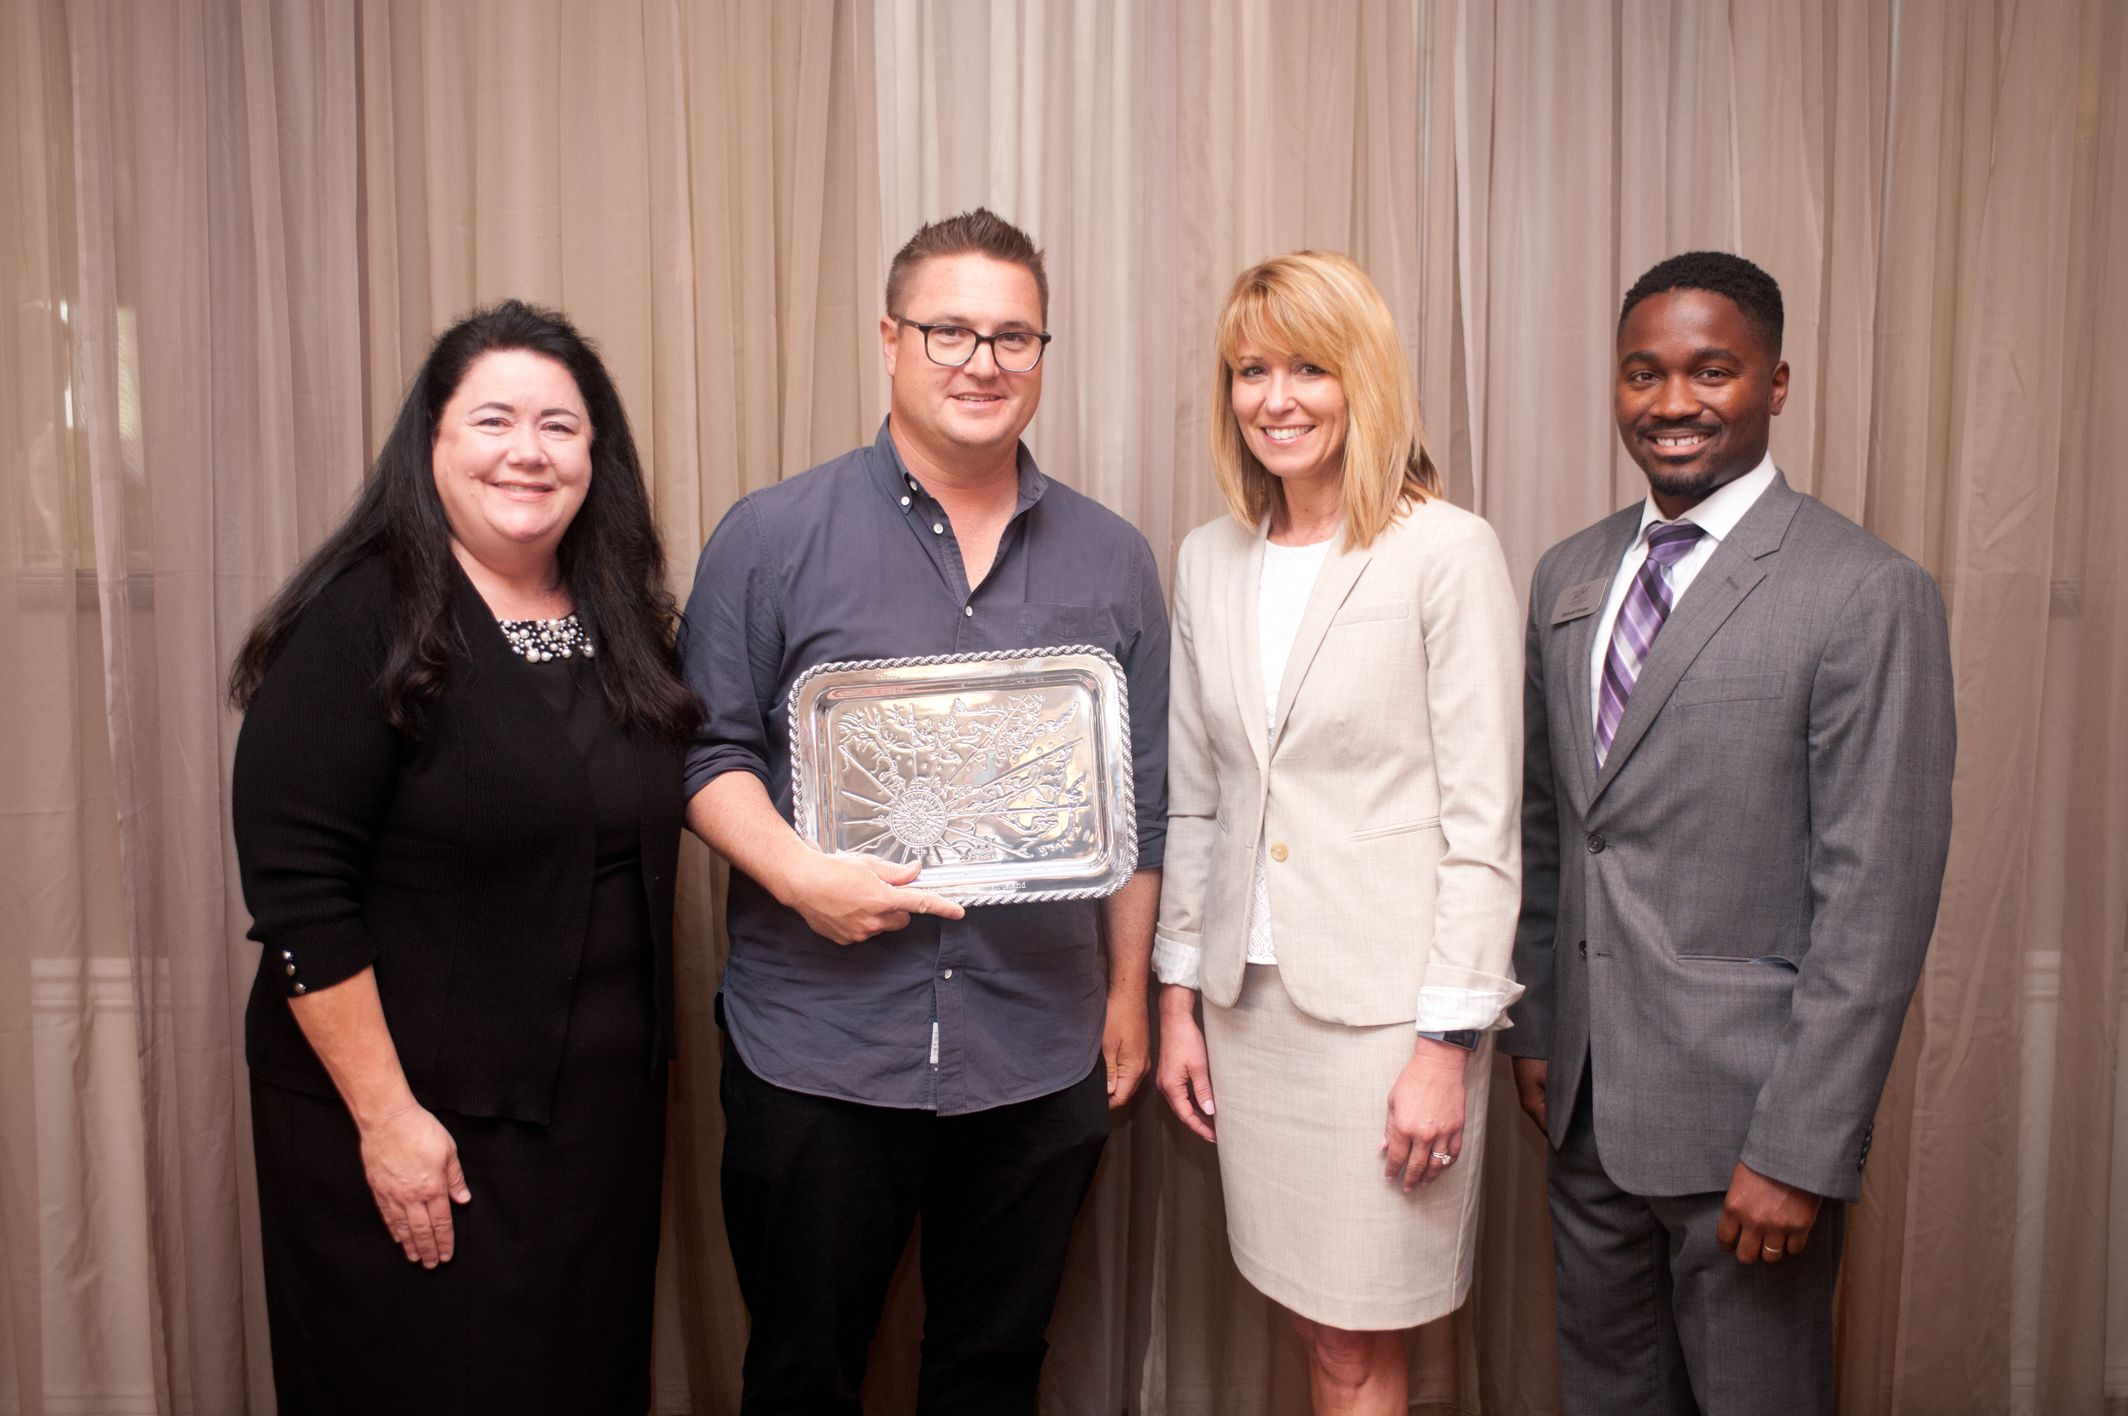 John Flannigan with award